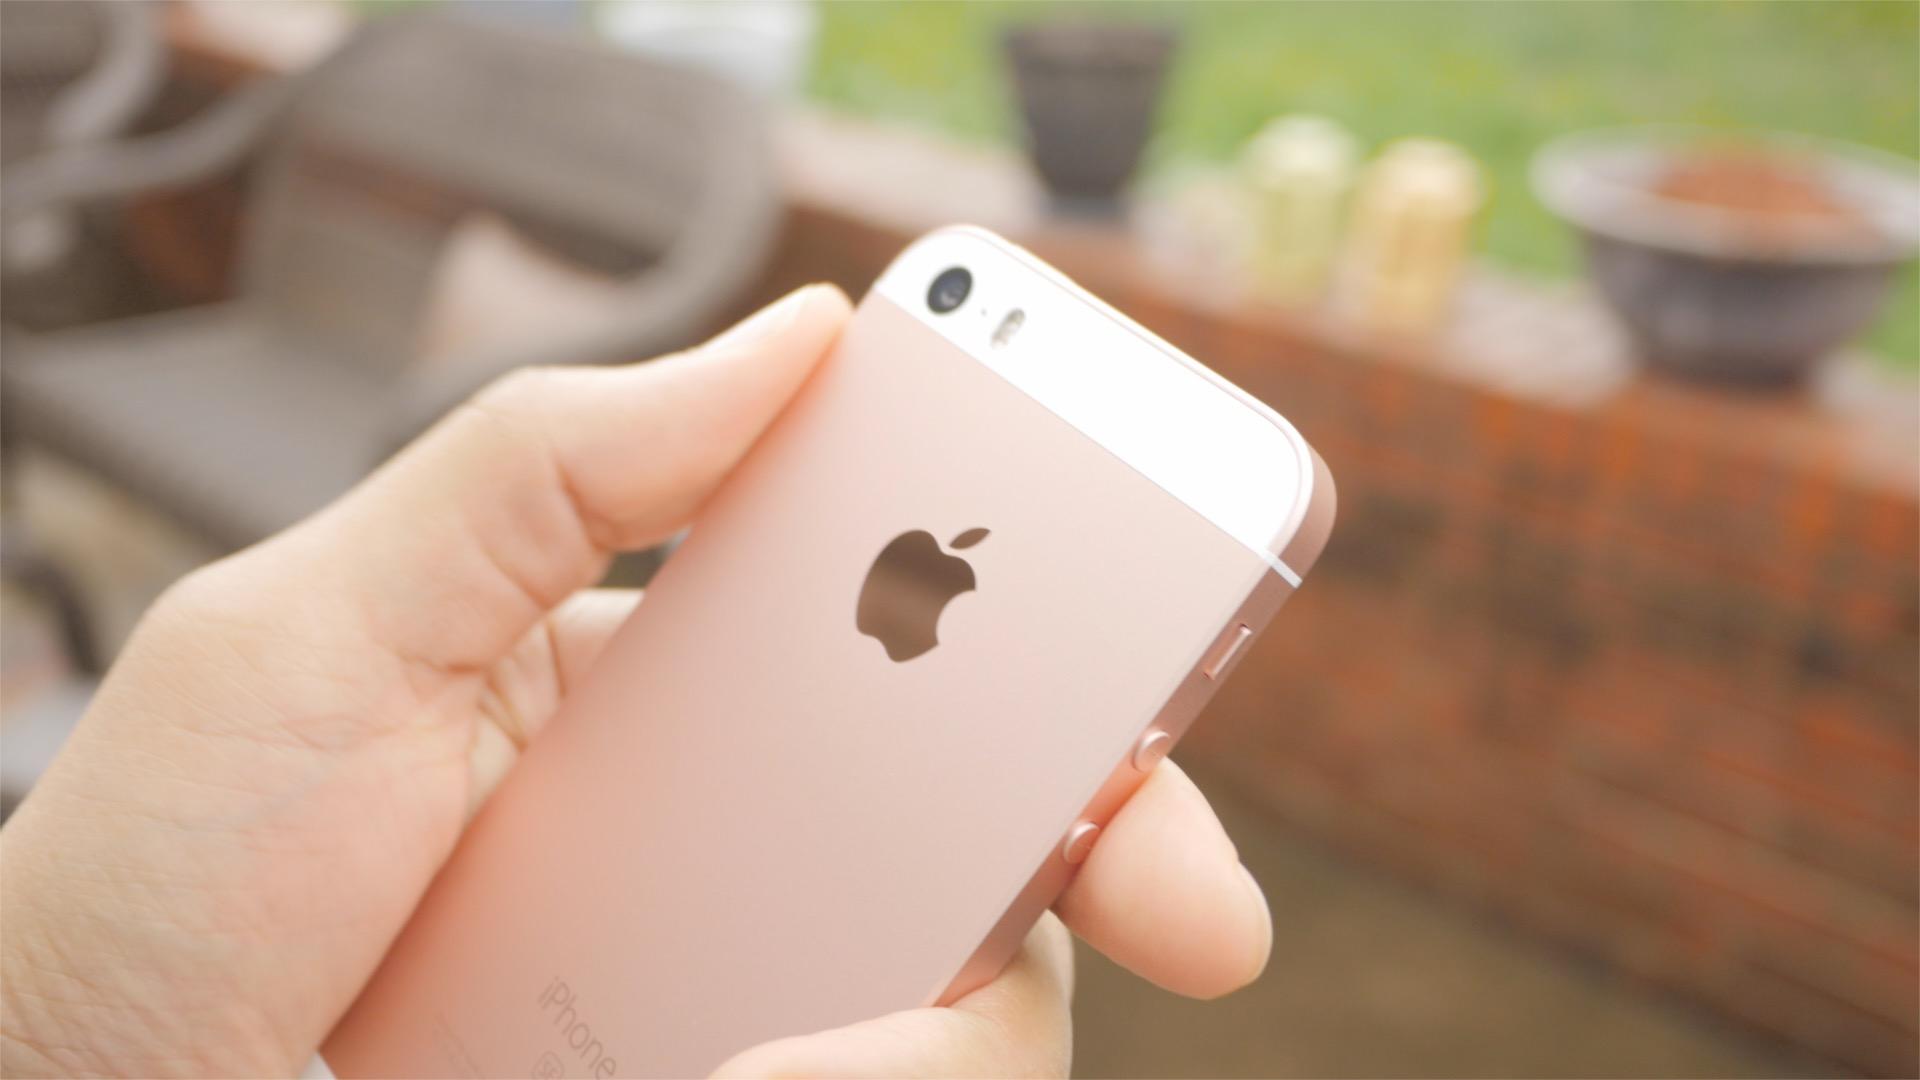 iPhone SE inset Apple Logo